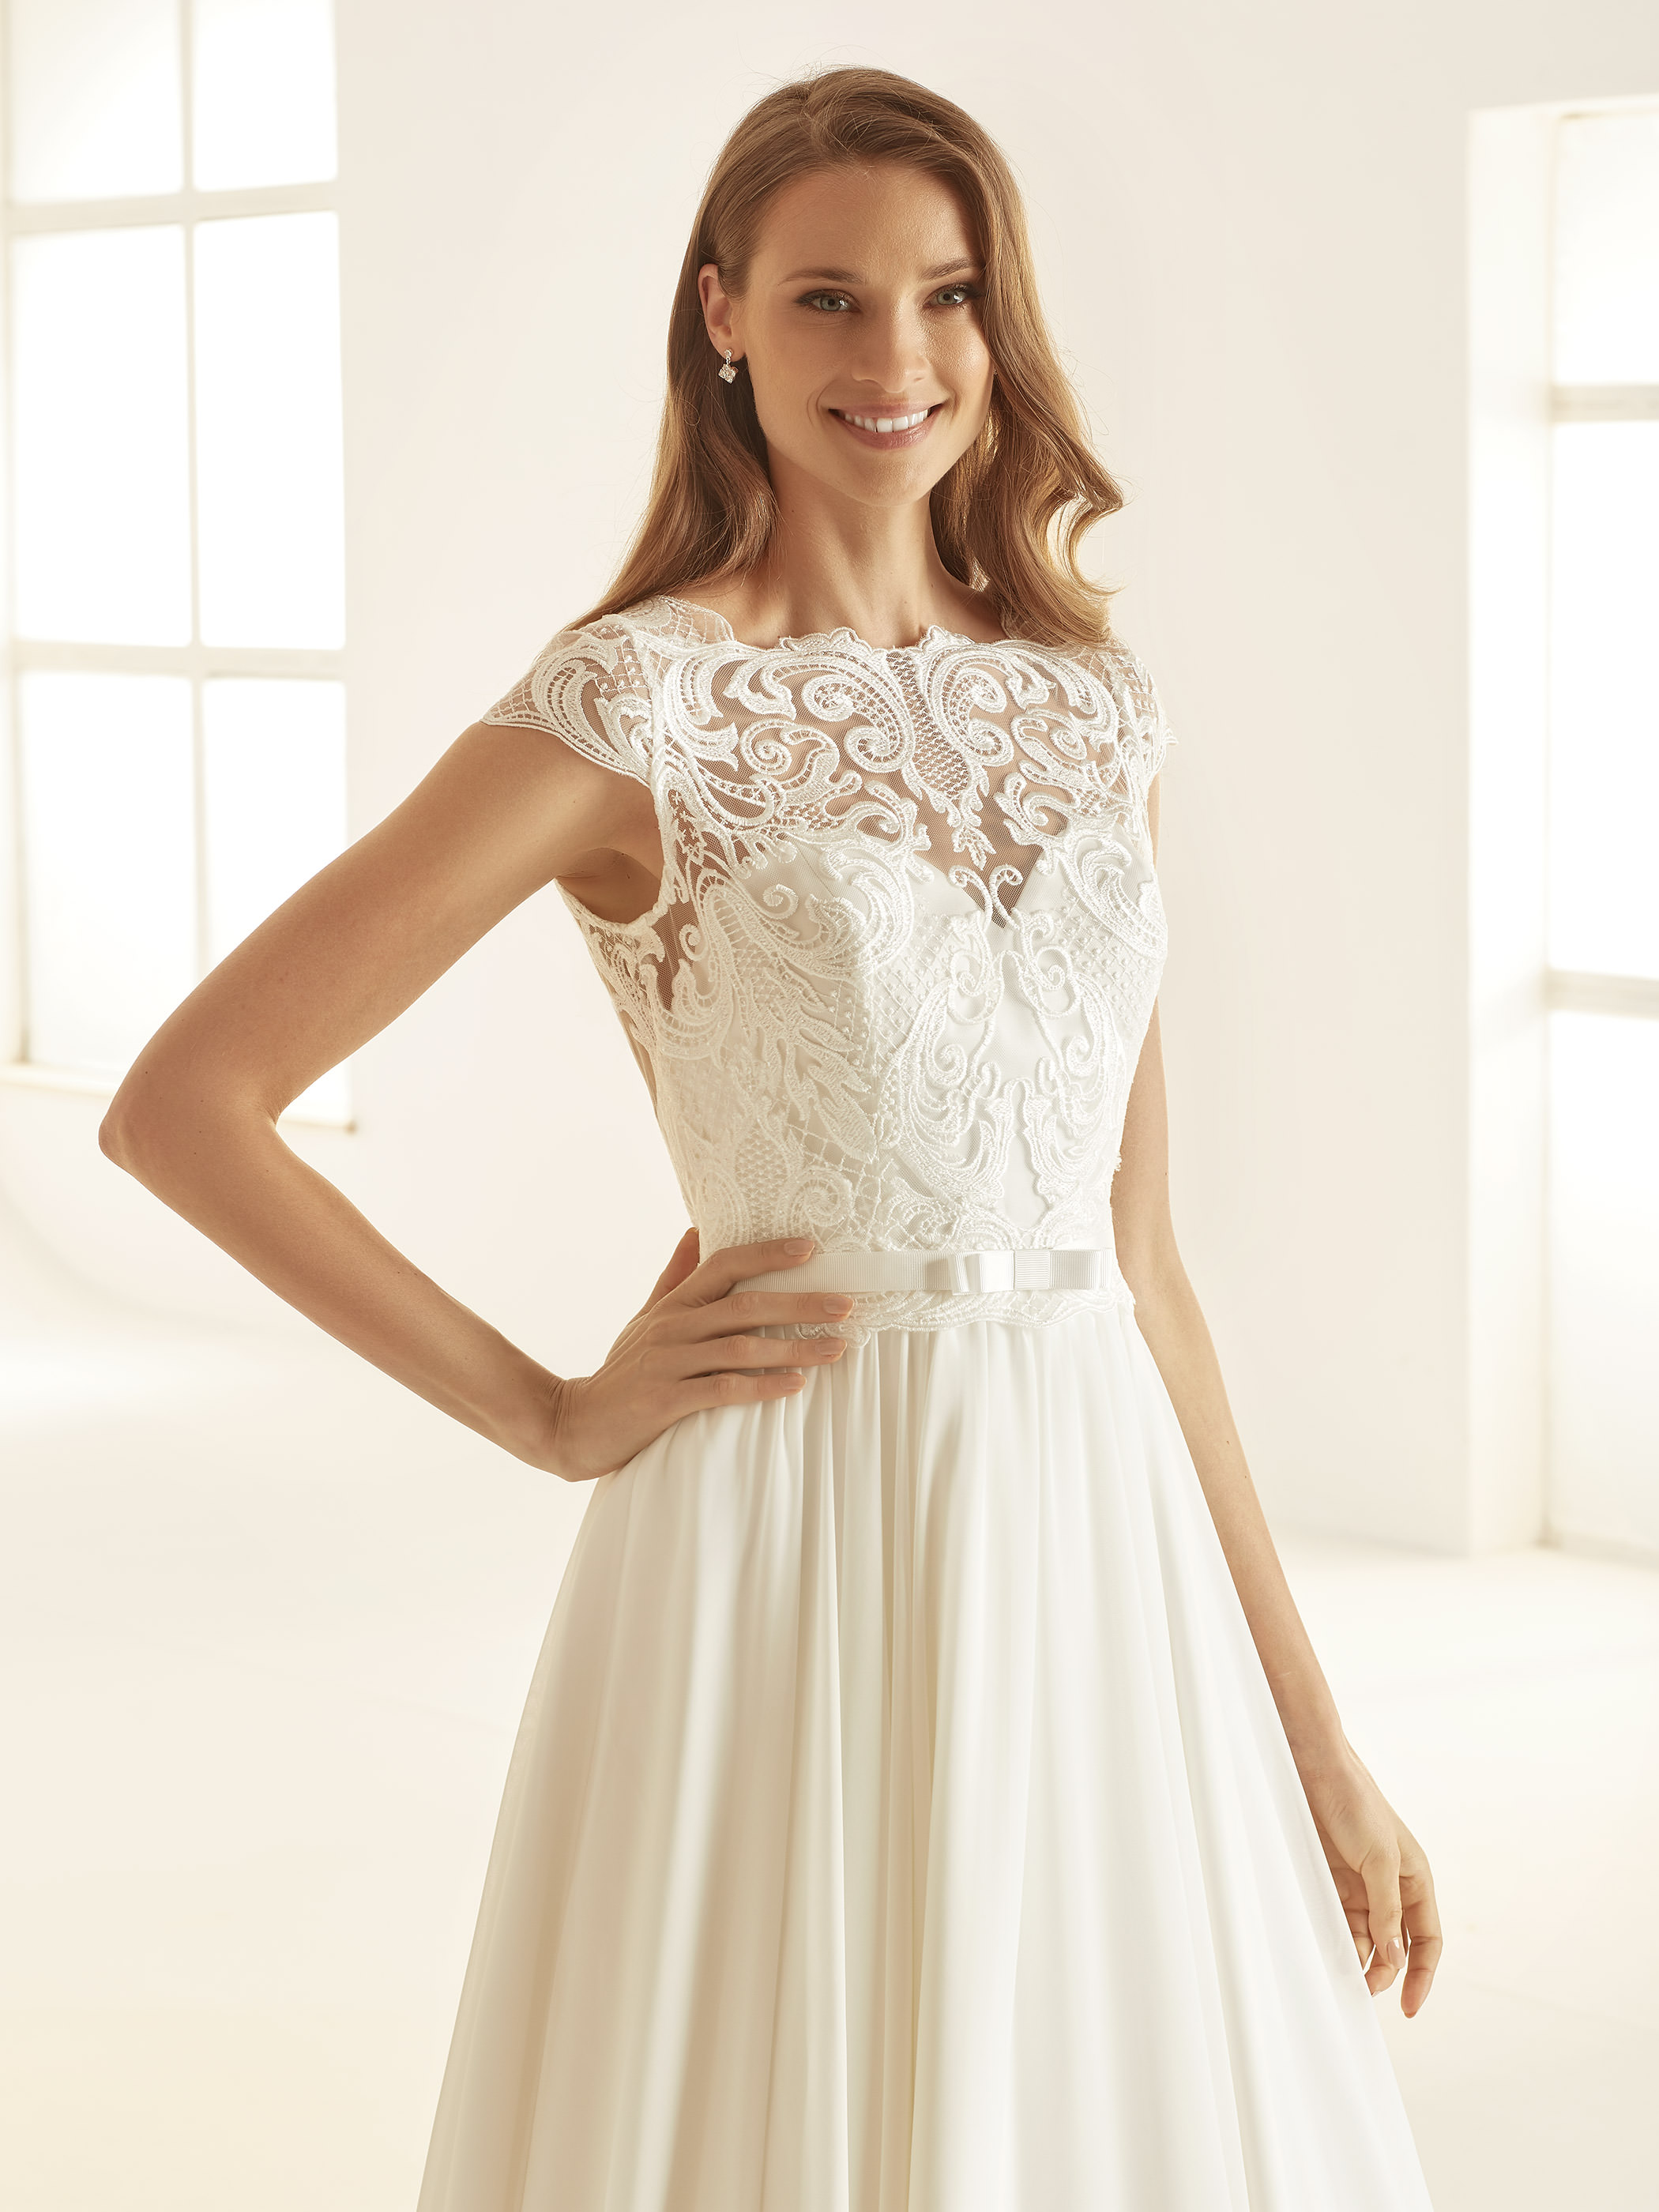 OLIVIA-Bianco-Evento-bridal-dress-(2)